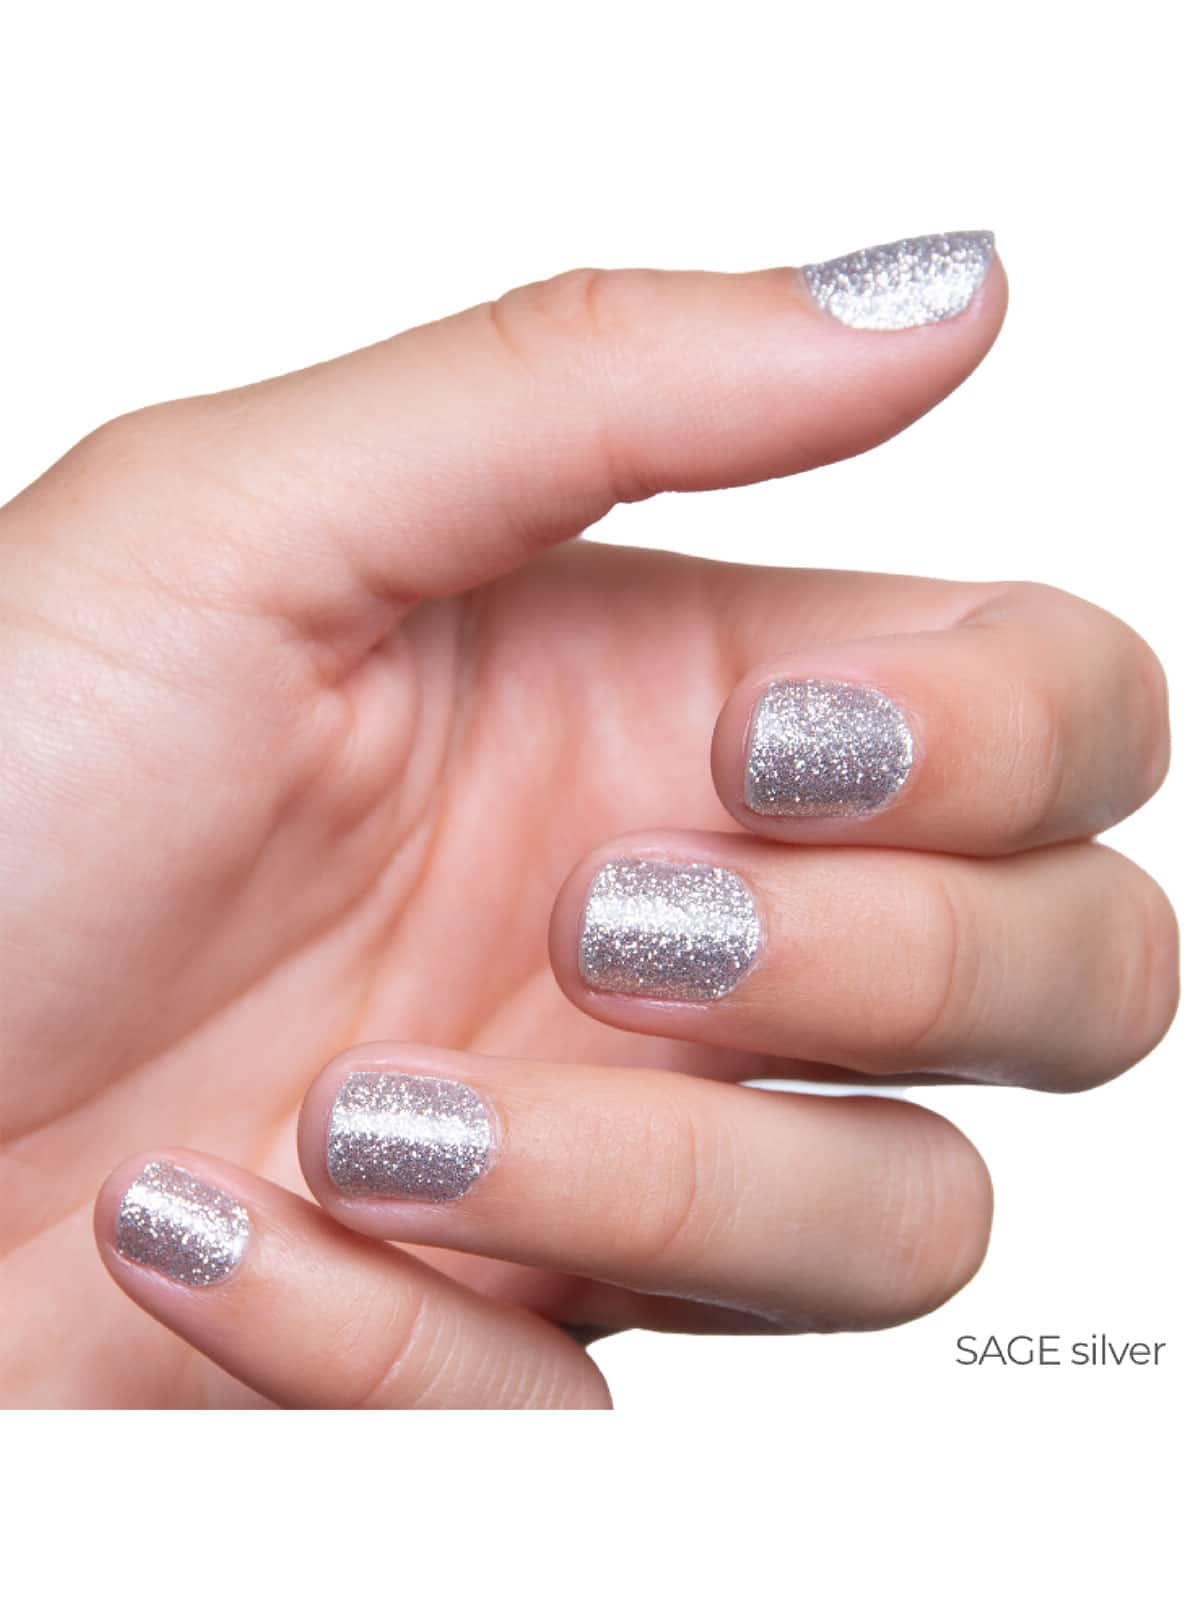 SAGE silver glitter